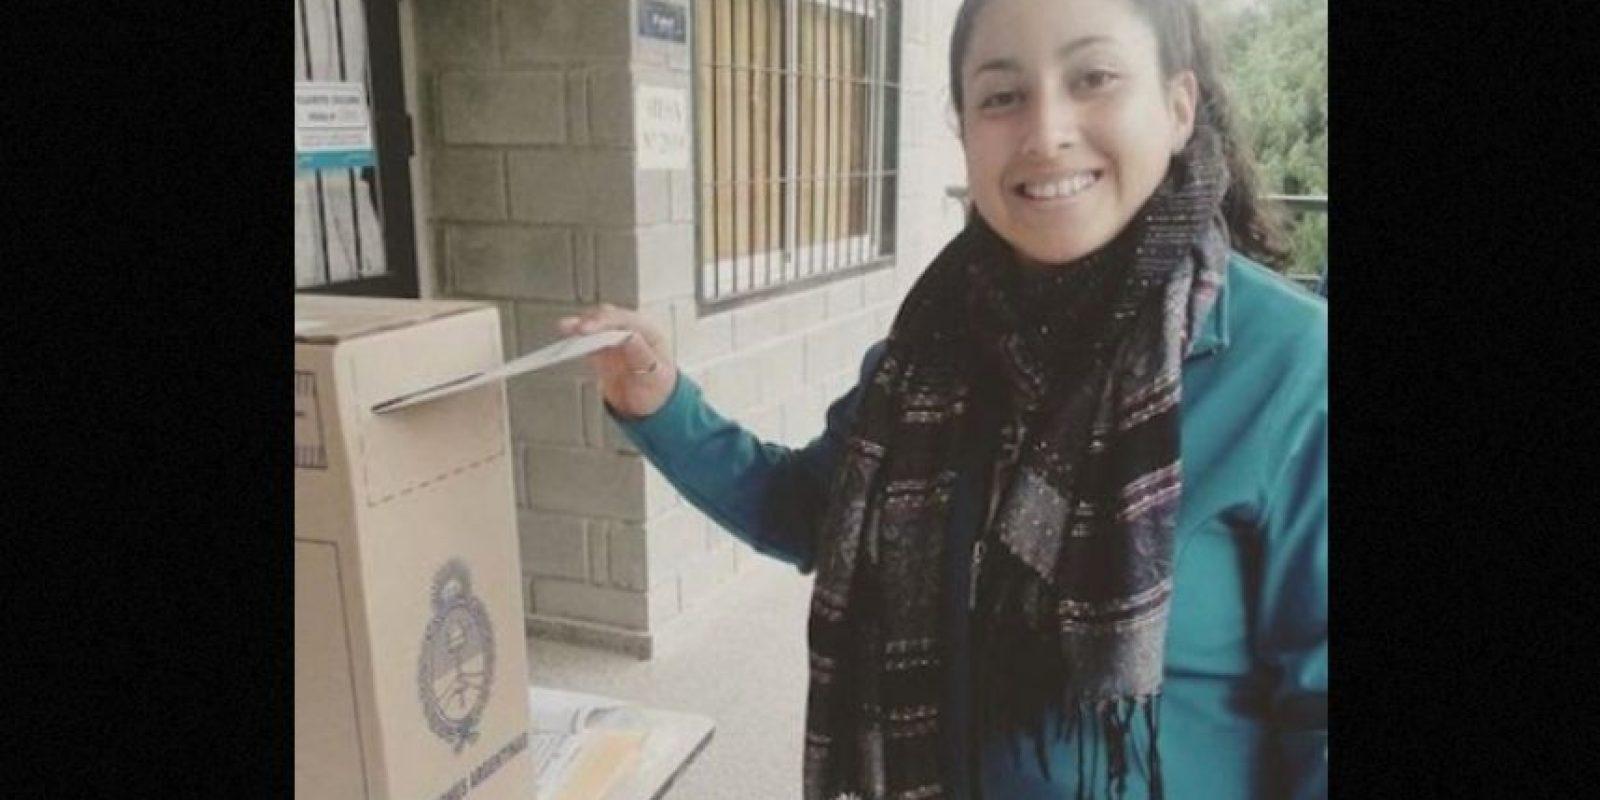 Foto:Via instagram.com/explore/tags/elecciones2015/